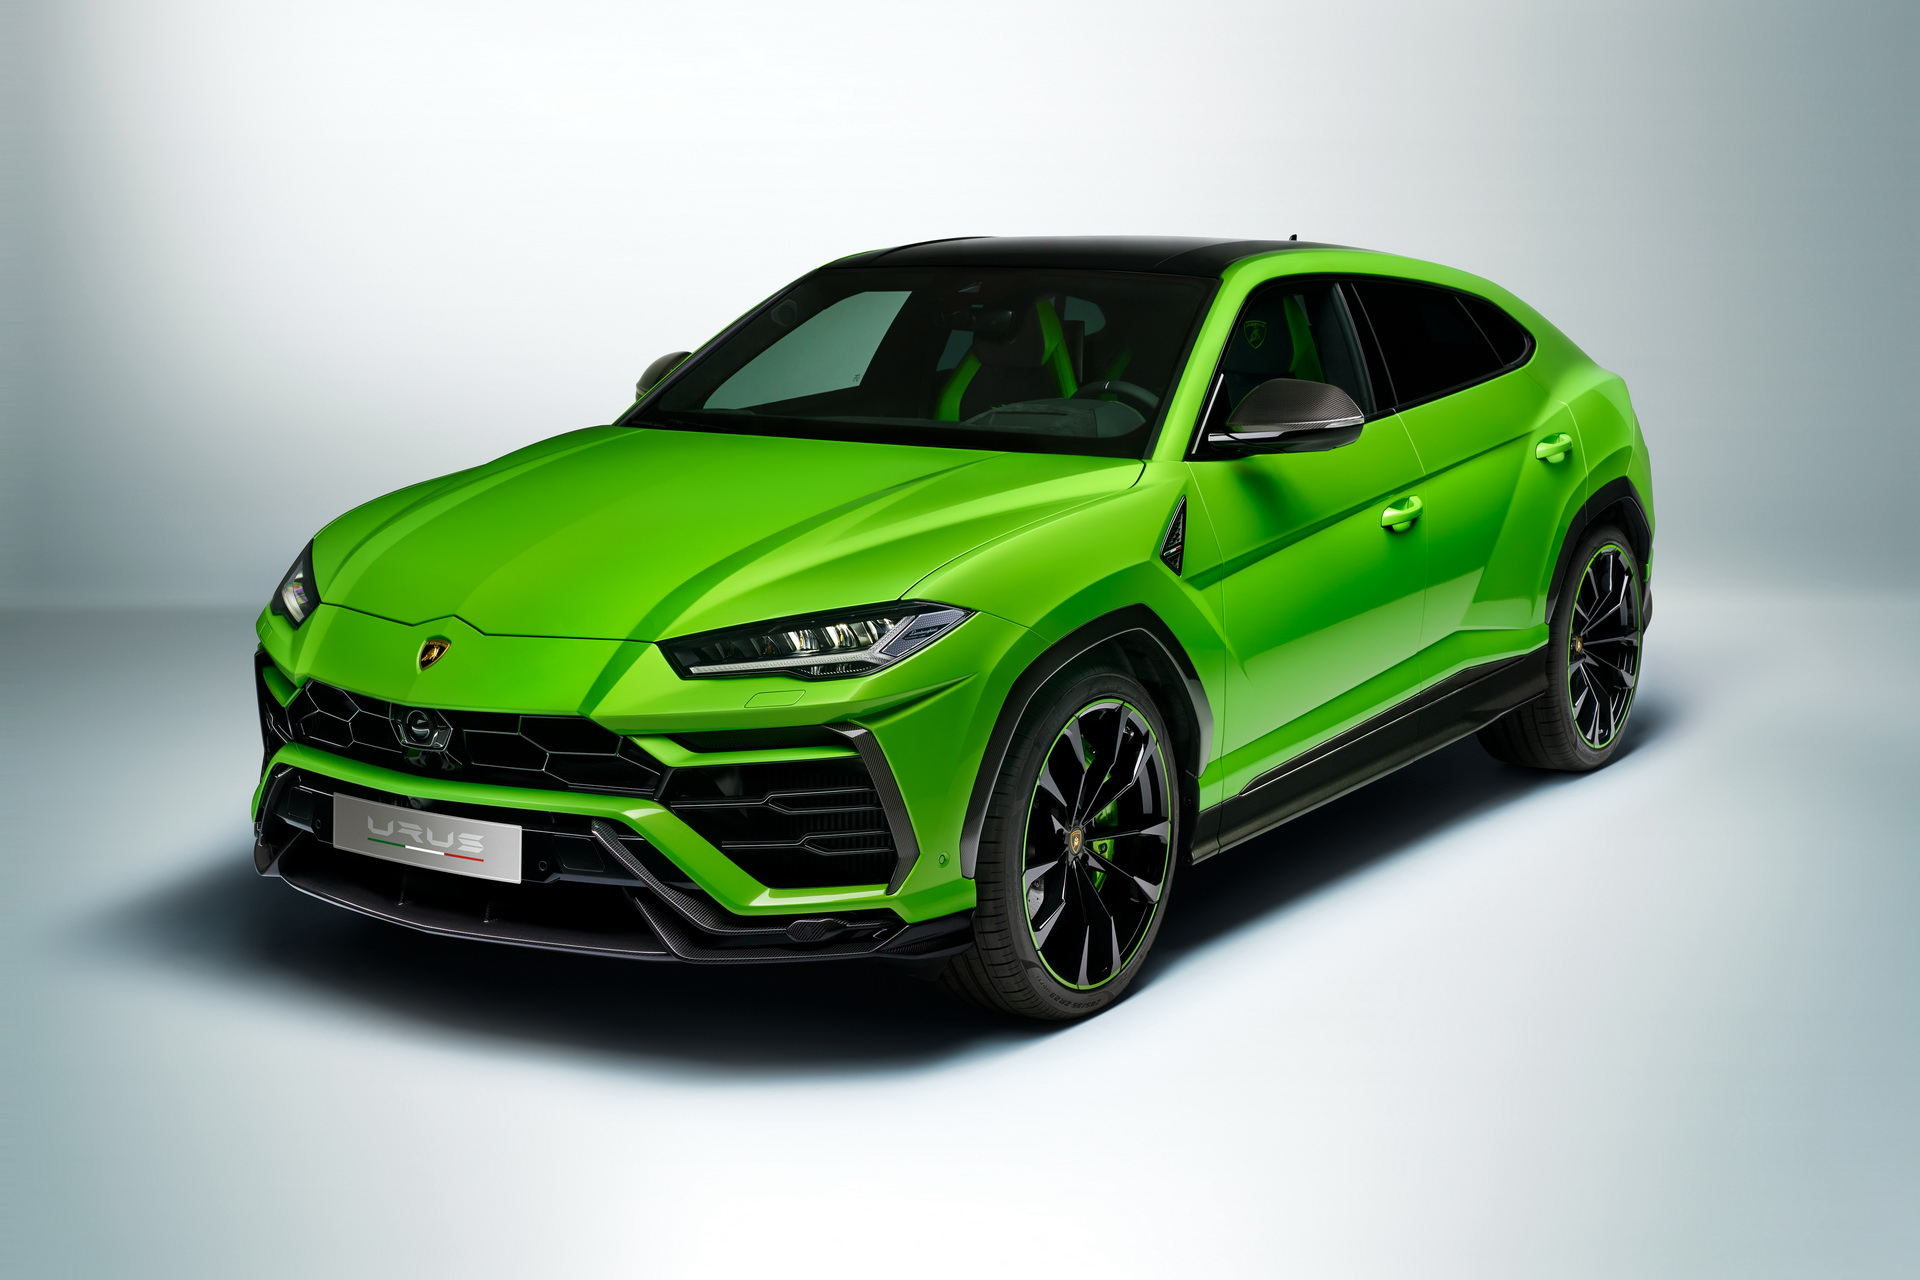 Lamborghini-Urus-Pearl-Capsule-Edition-3